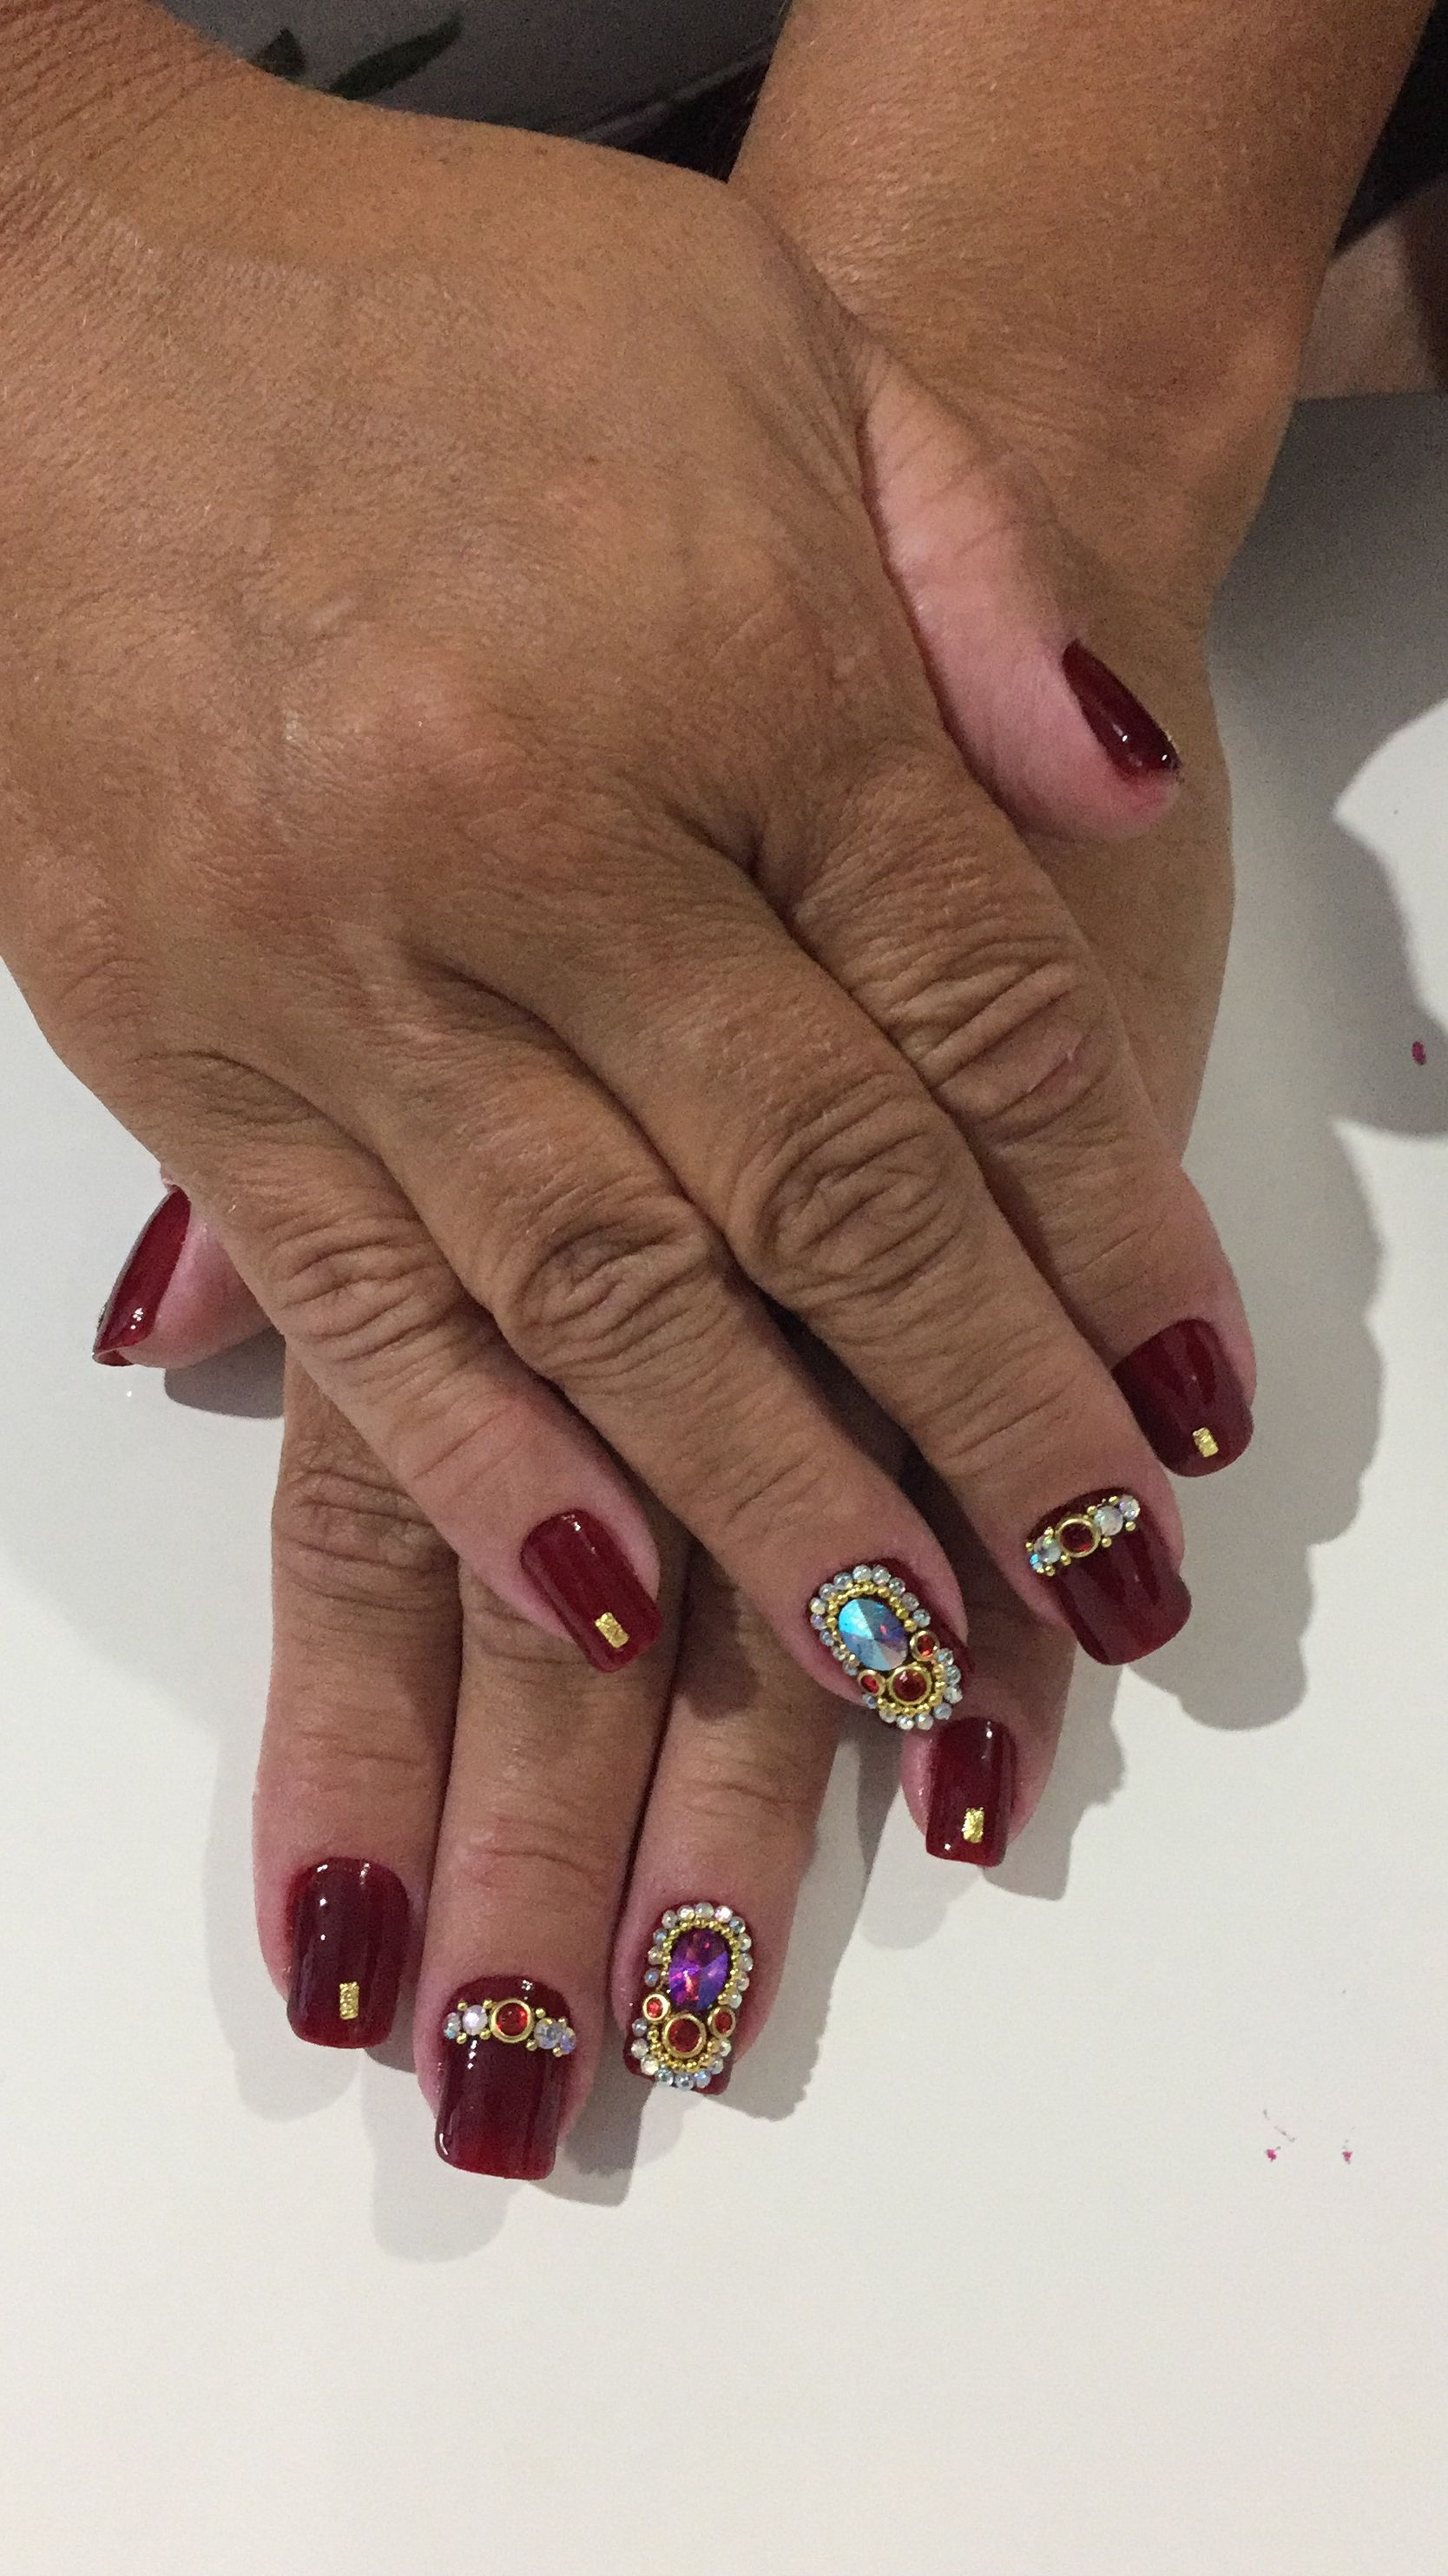 Pin de Vicky Dwerryhouse 💋 em Nails e joias diversas ...